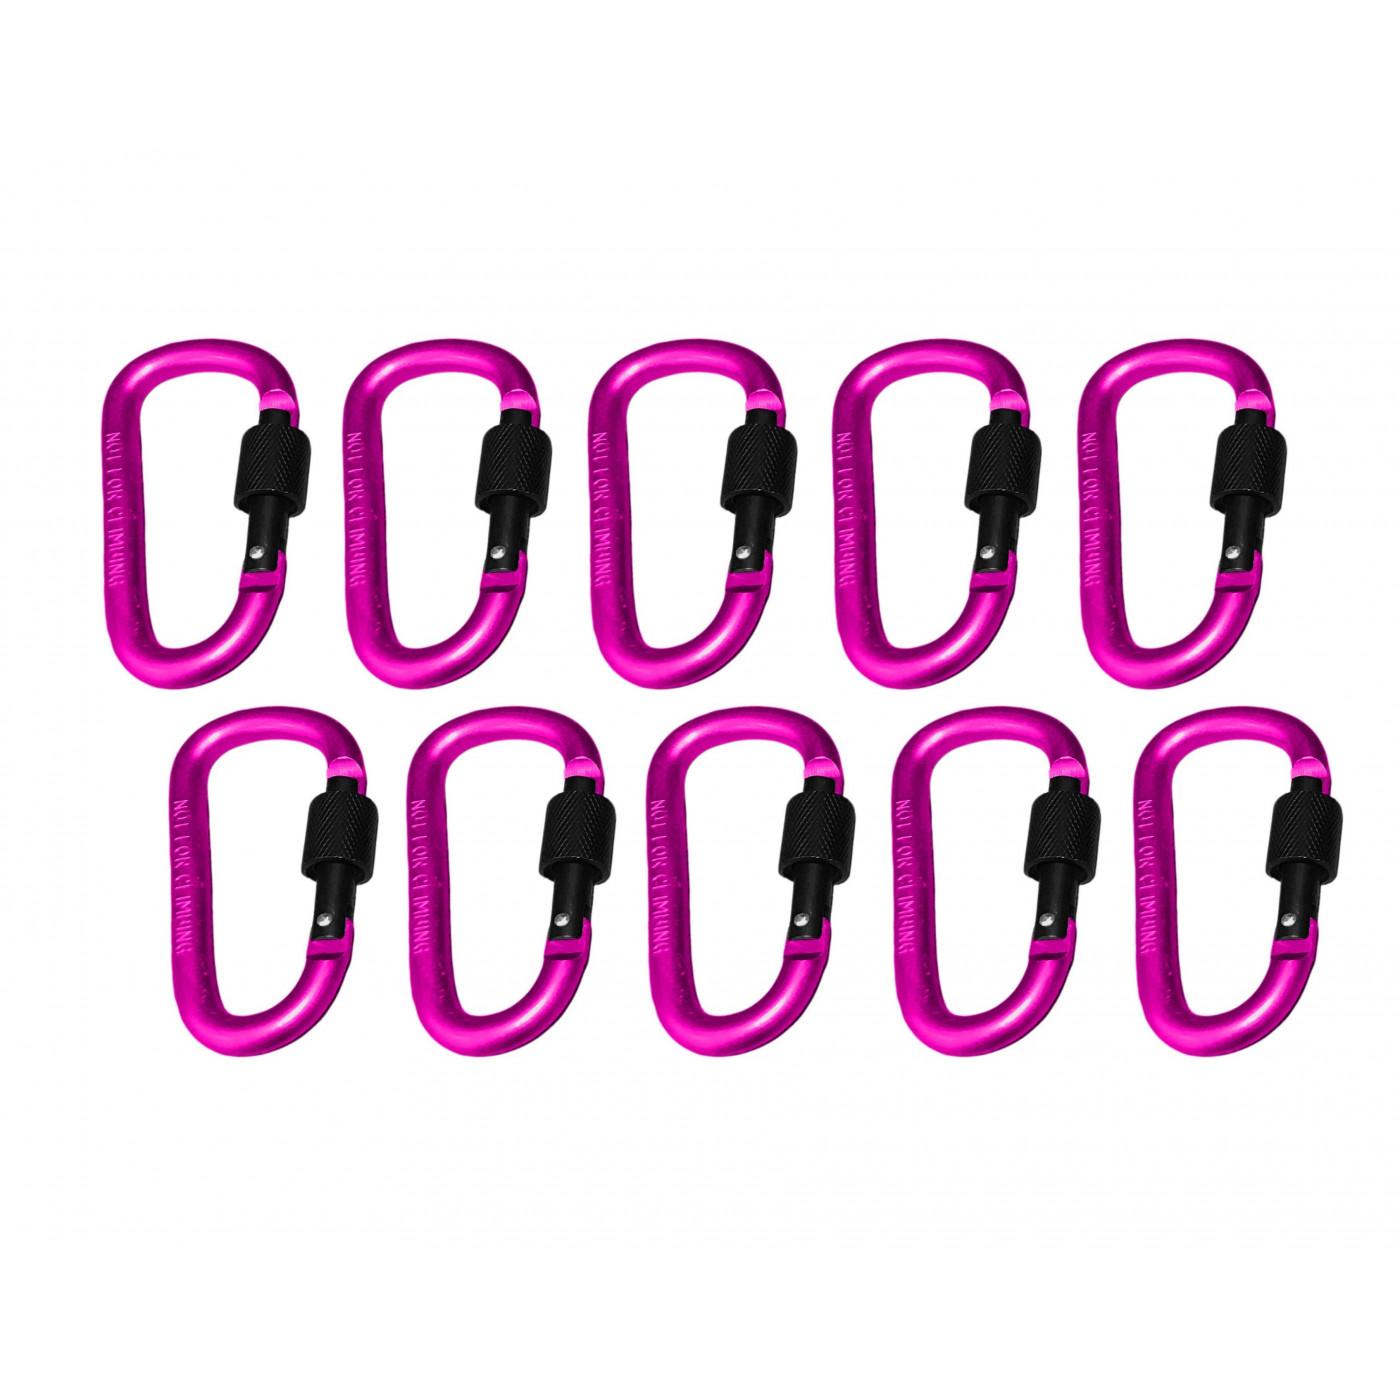 Set of 10 carabiners, color 10: pink, 100 kg